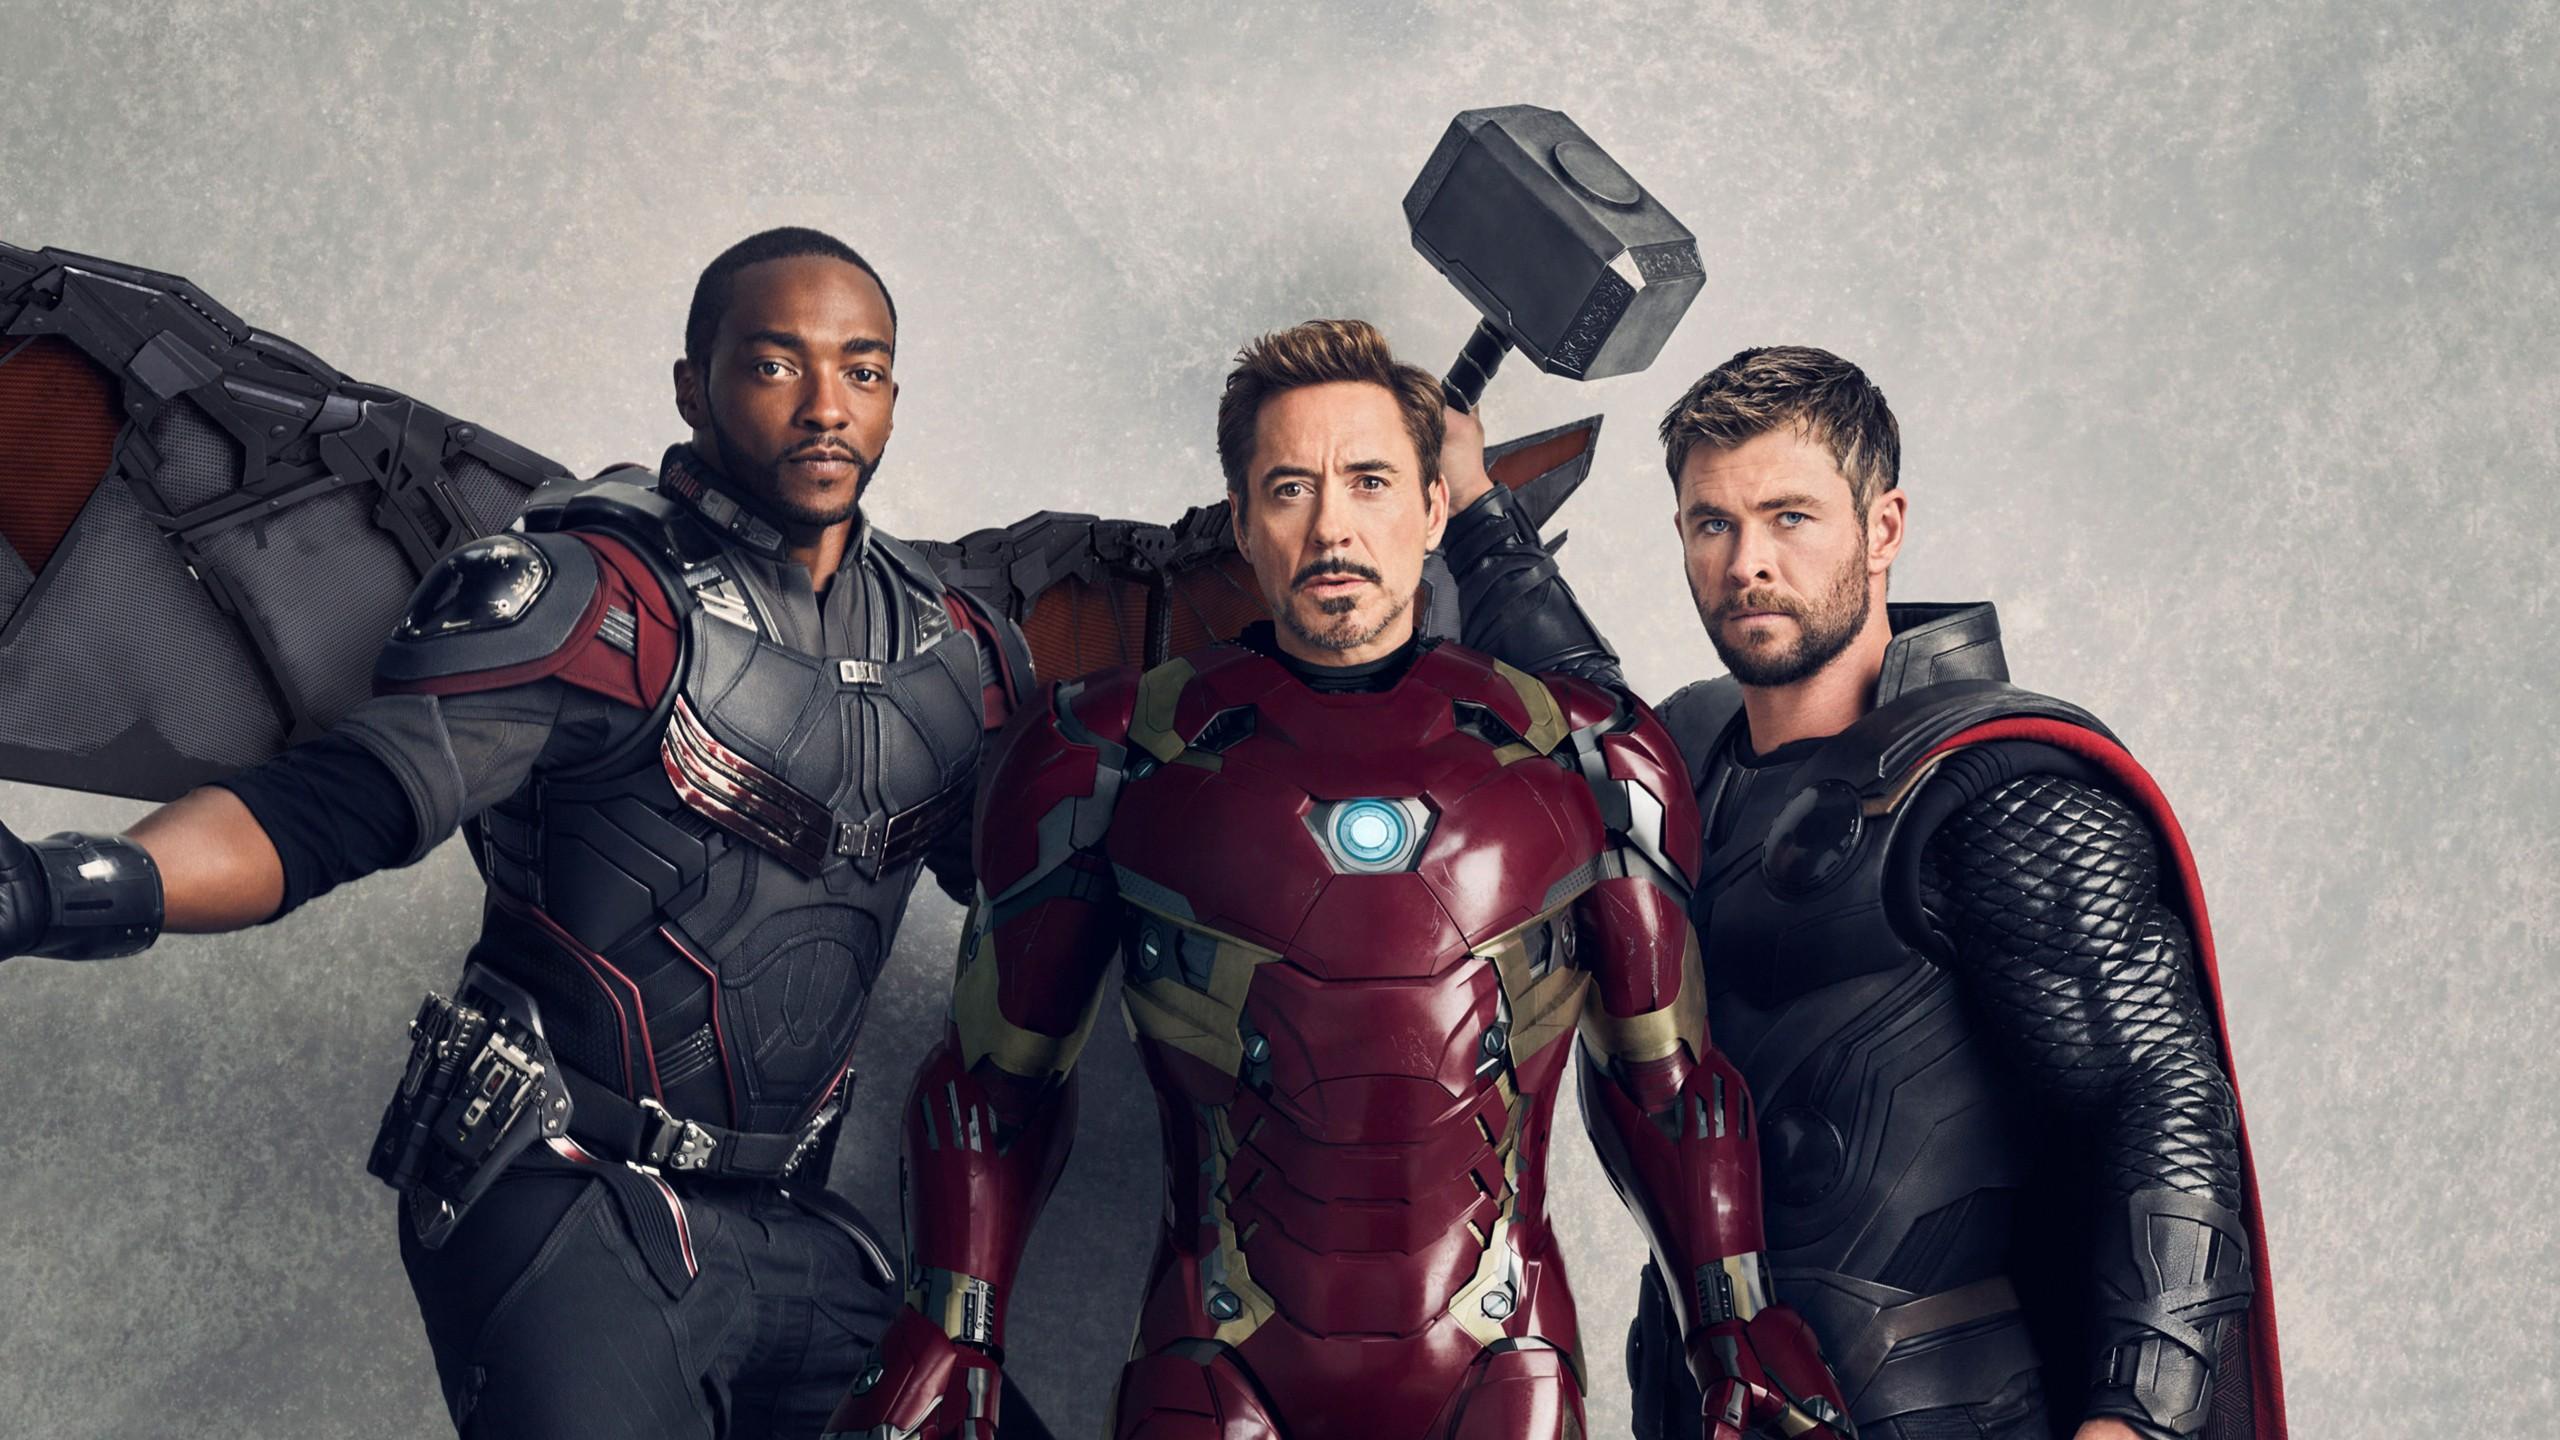 Wallpaper Avengers Infinity War Falcon Iron Man Thor Anthony Mackie Robert Downey Jr Chris Hemsworth 5k Movies 17361